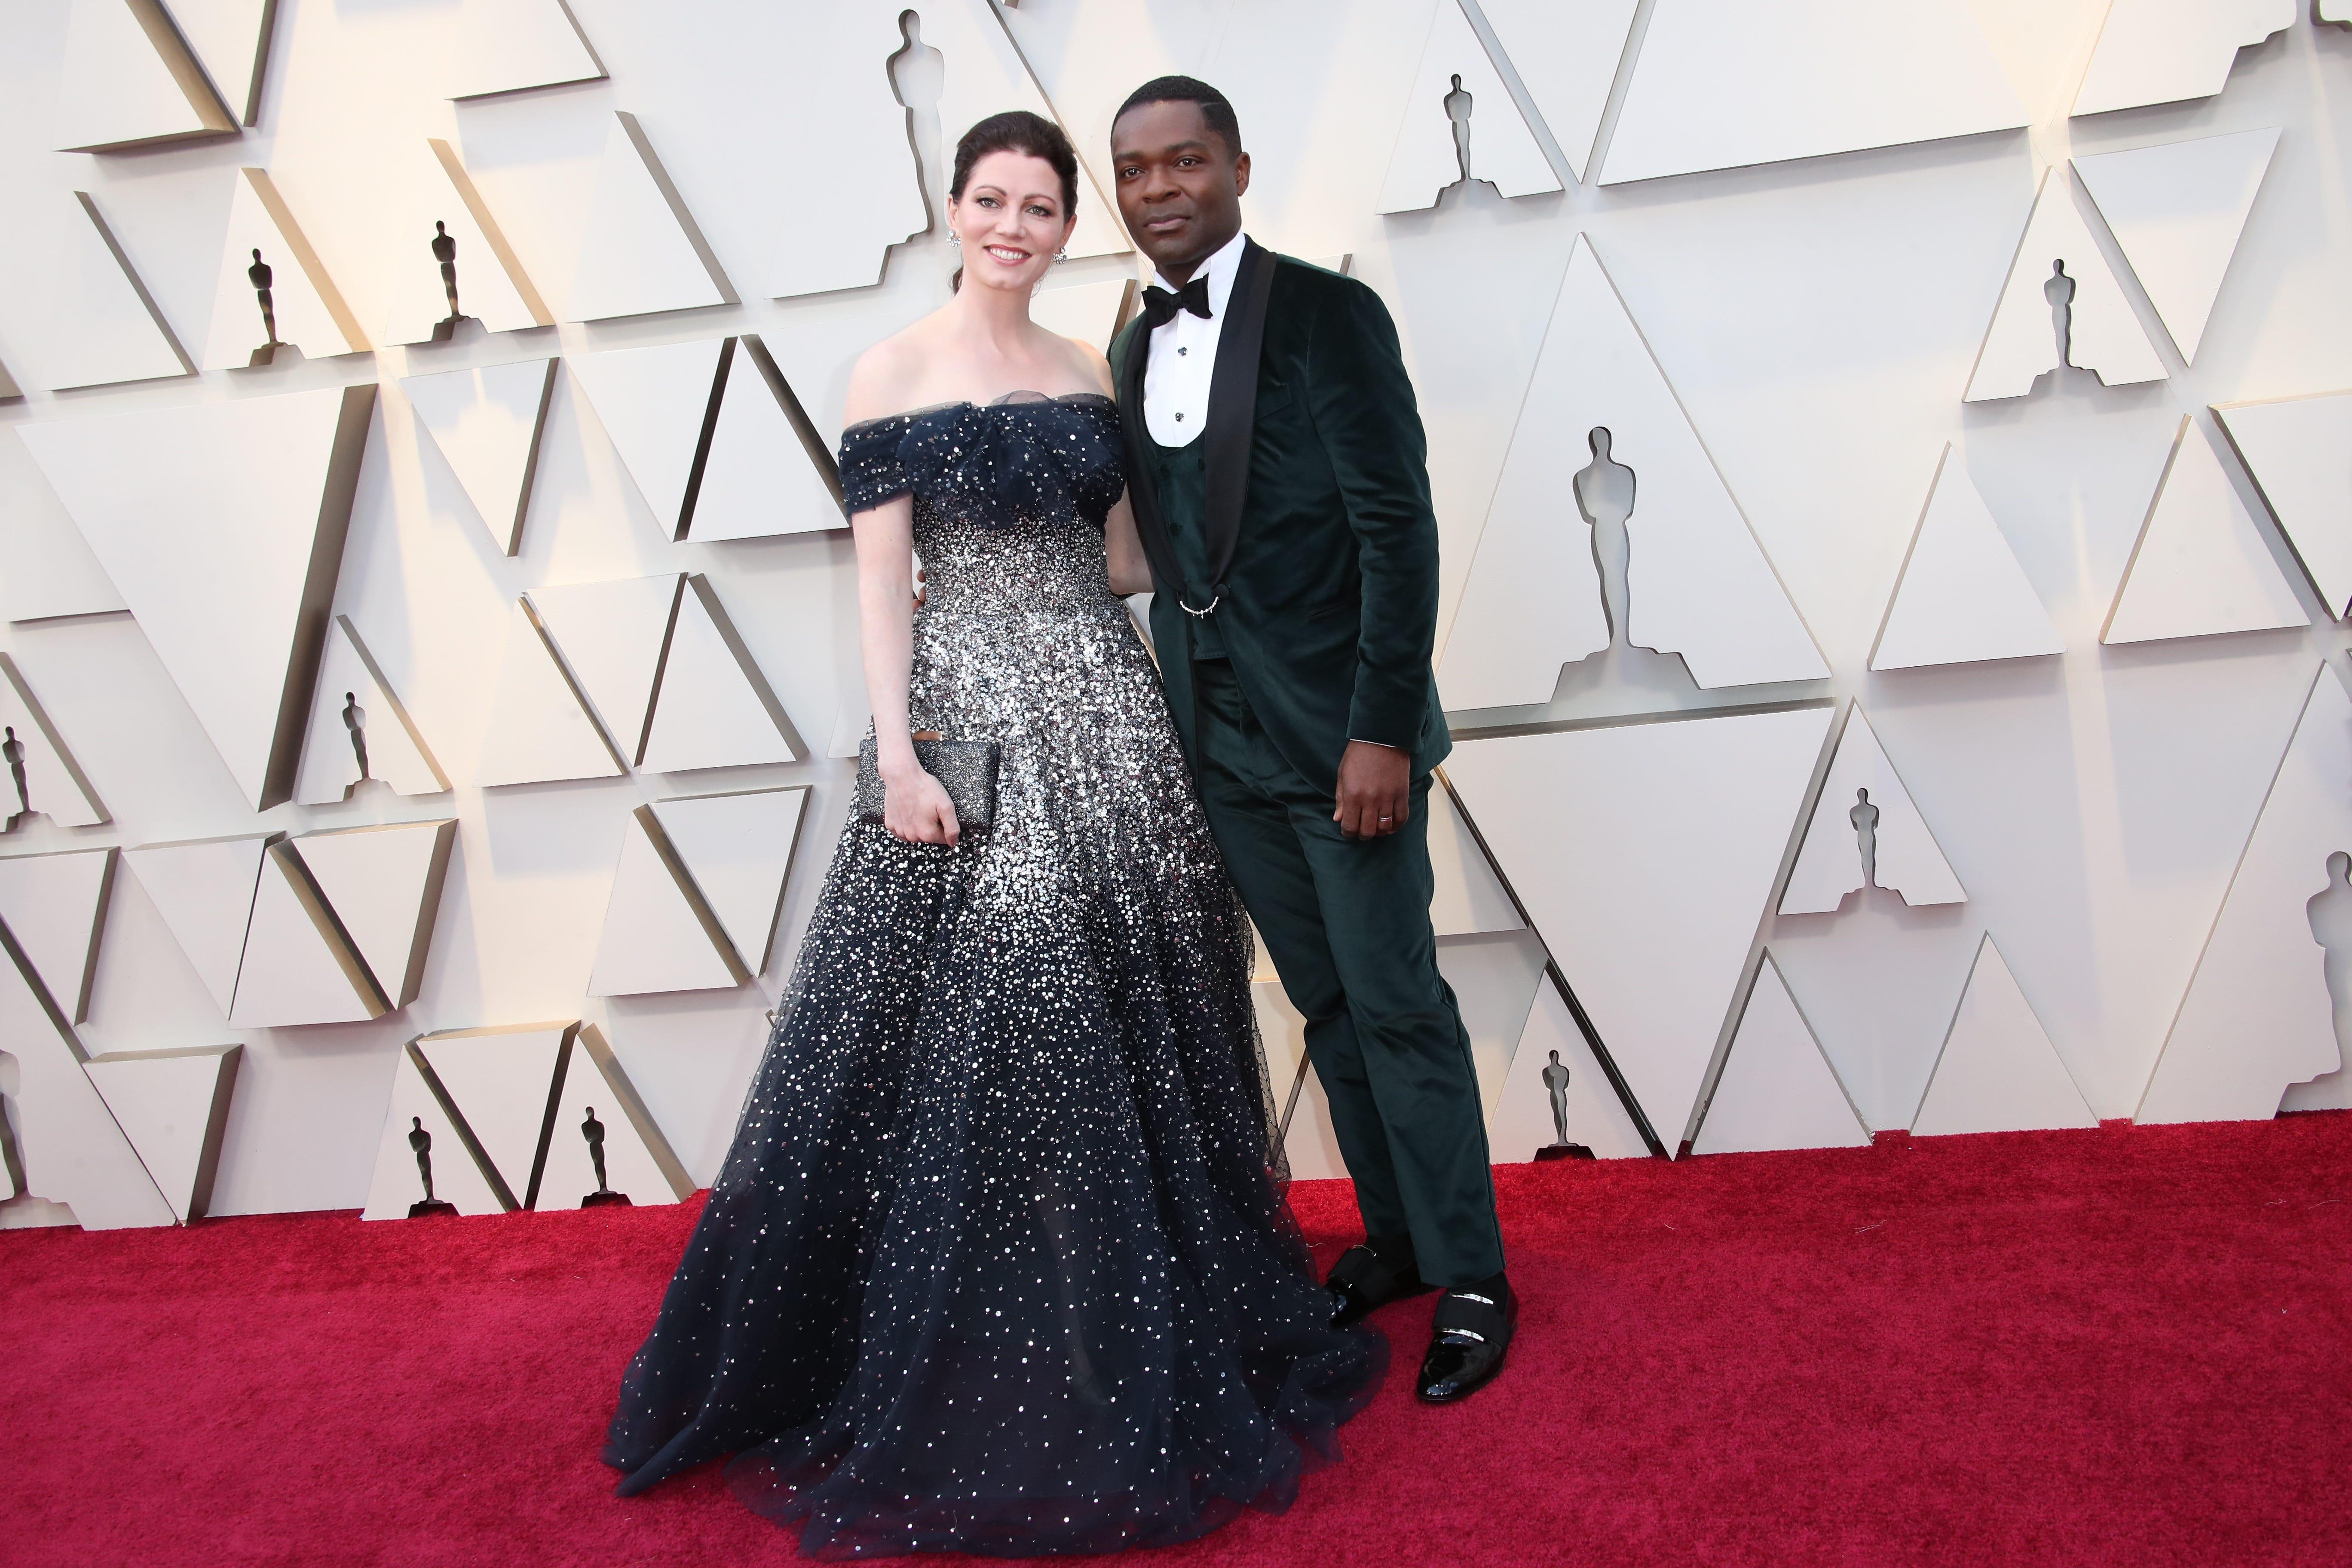 February 24, 2019; Los Angeles, CA, USA; Jessica Oyelowo, left and David Oyelowo arrive at the 91st Academy Awards at the Dolby Theatre. Mandatory Credit: Dan MacMedan-USA TODAY NETWORK (Via OlyDrop)